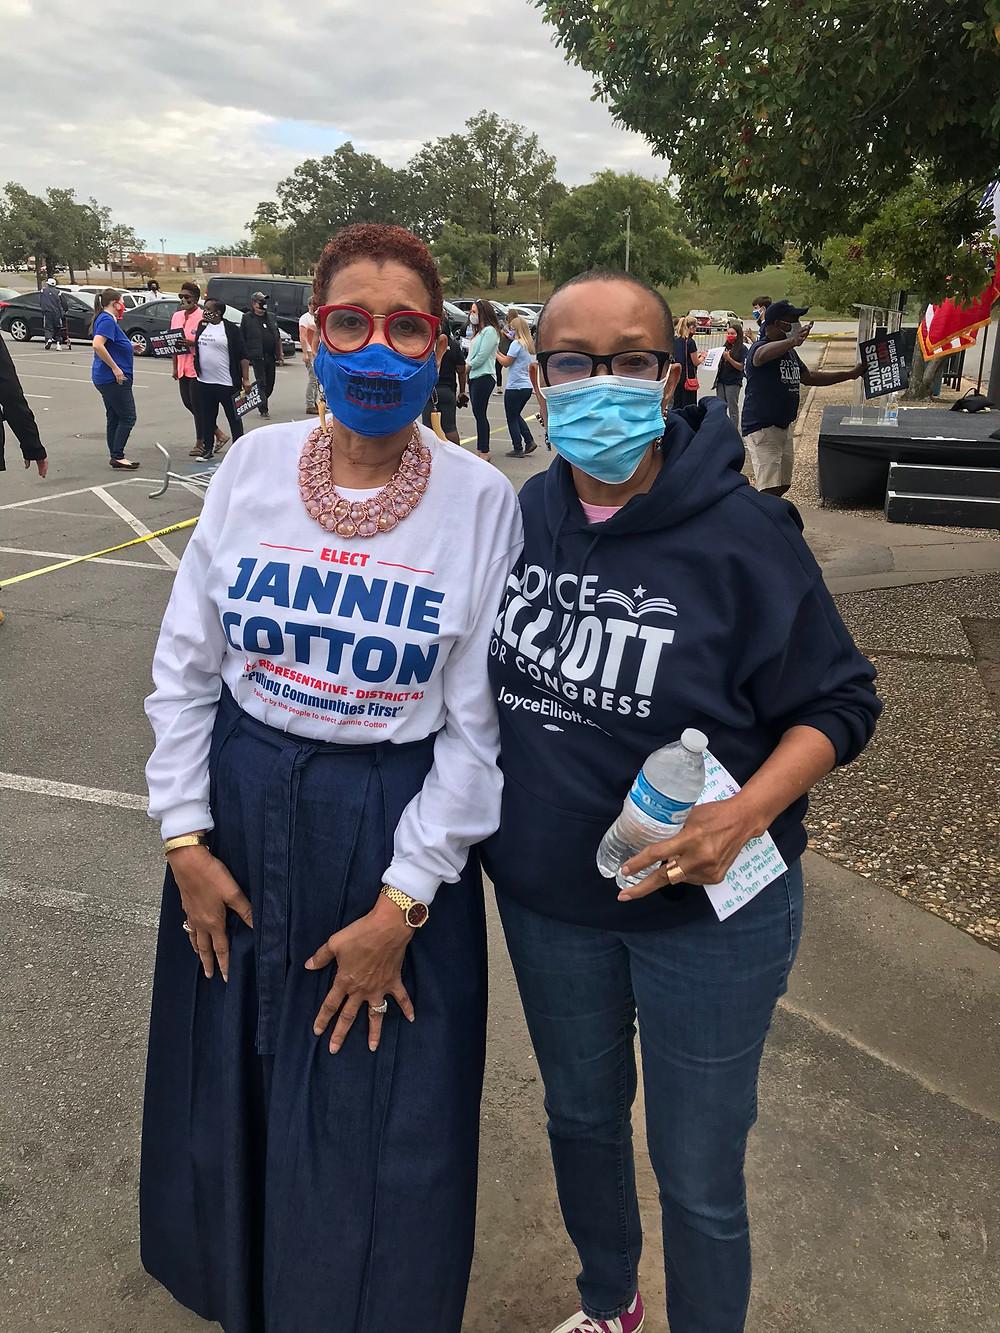 Candidate Jannie Cotton & Senator Joyce Elliot at the Joyce Elliot Campaign Rally